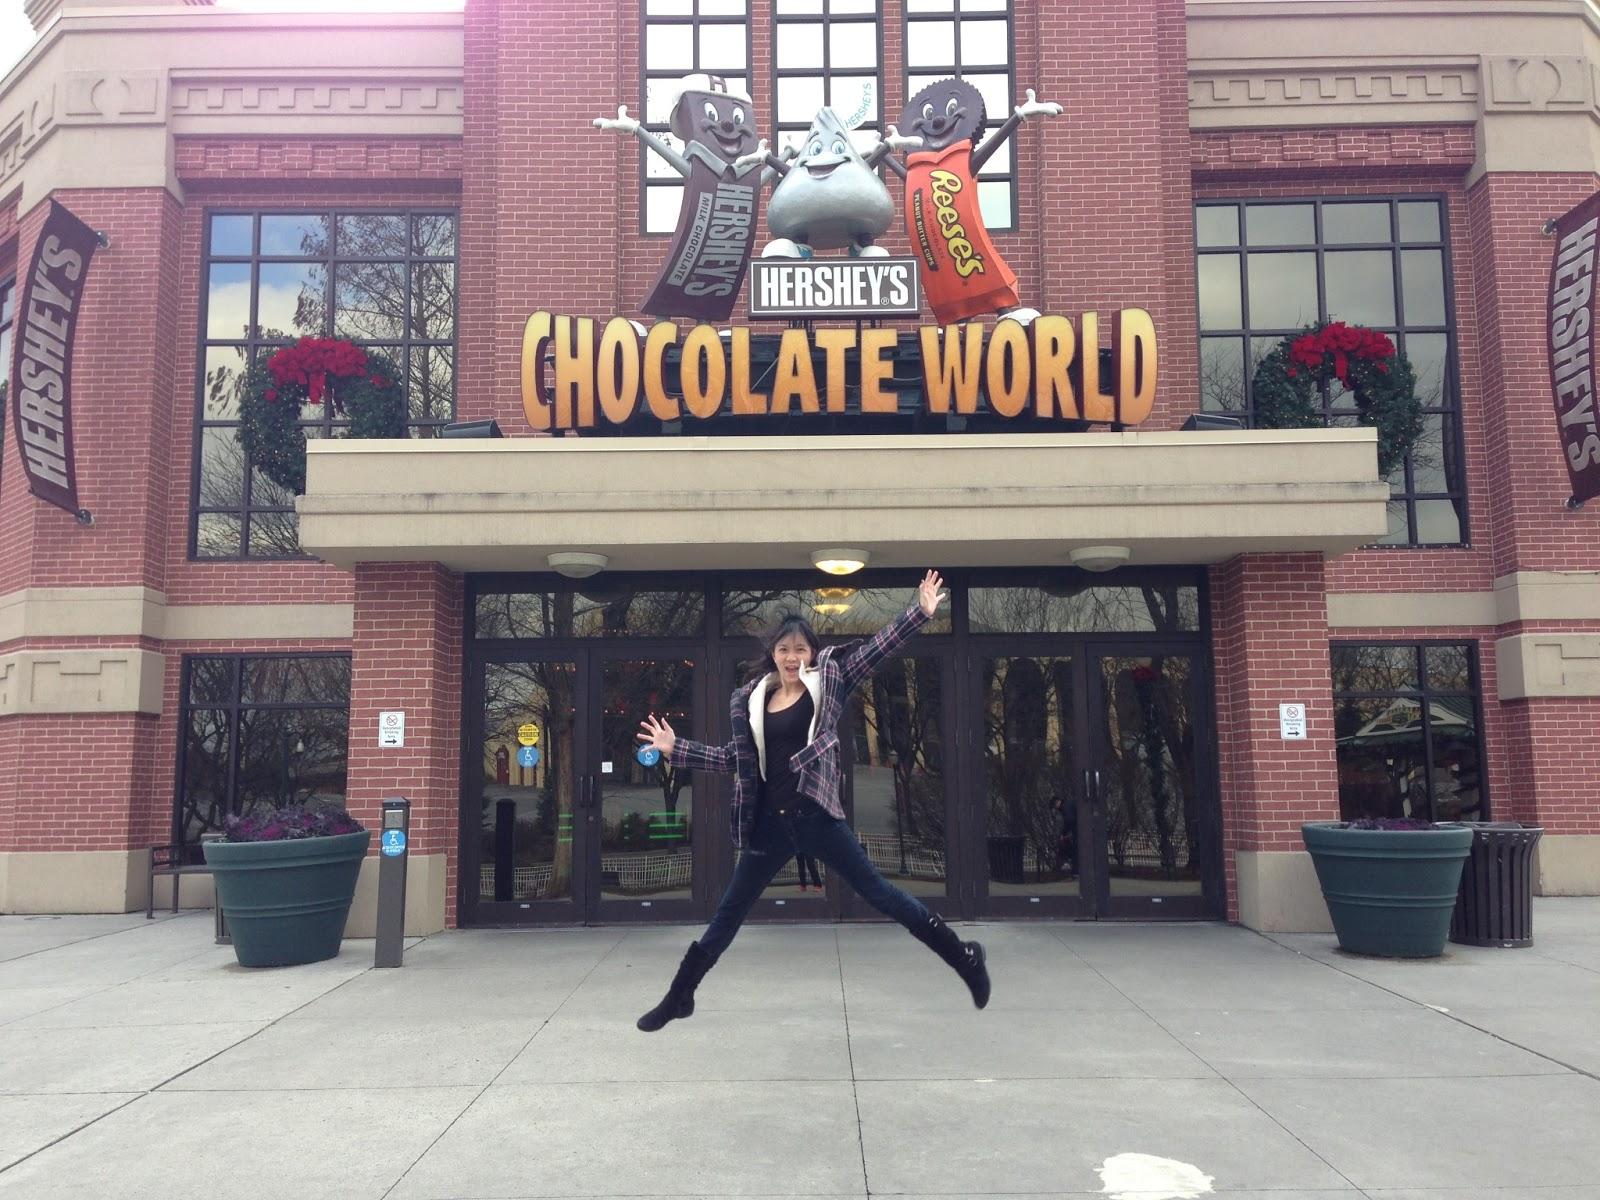 louisatrixie: USA Trip Day 4: Hershey's Chocolate World